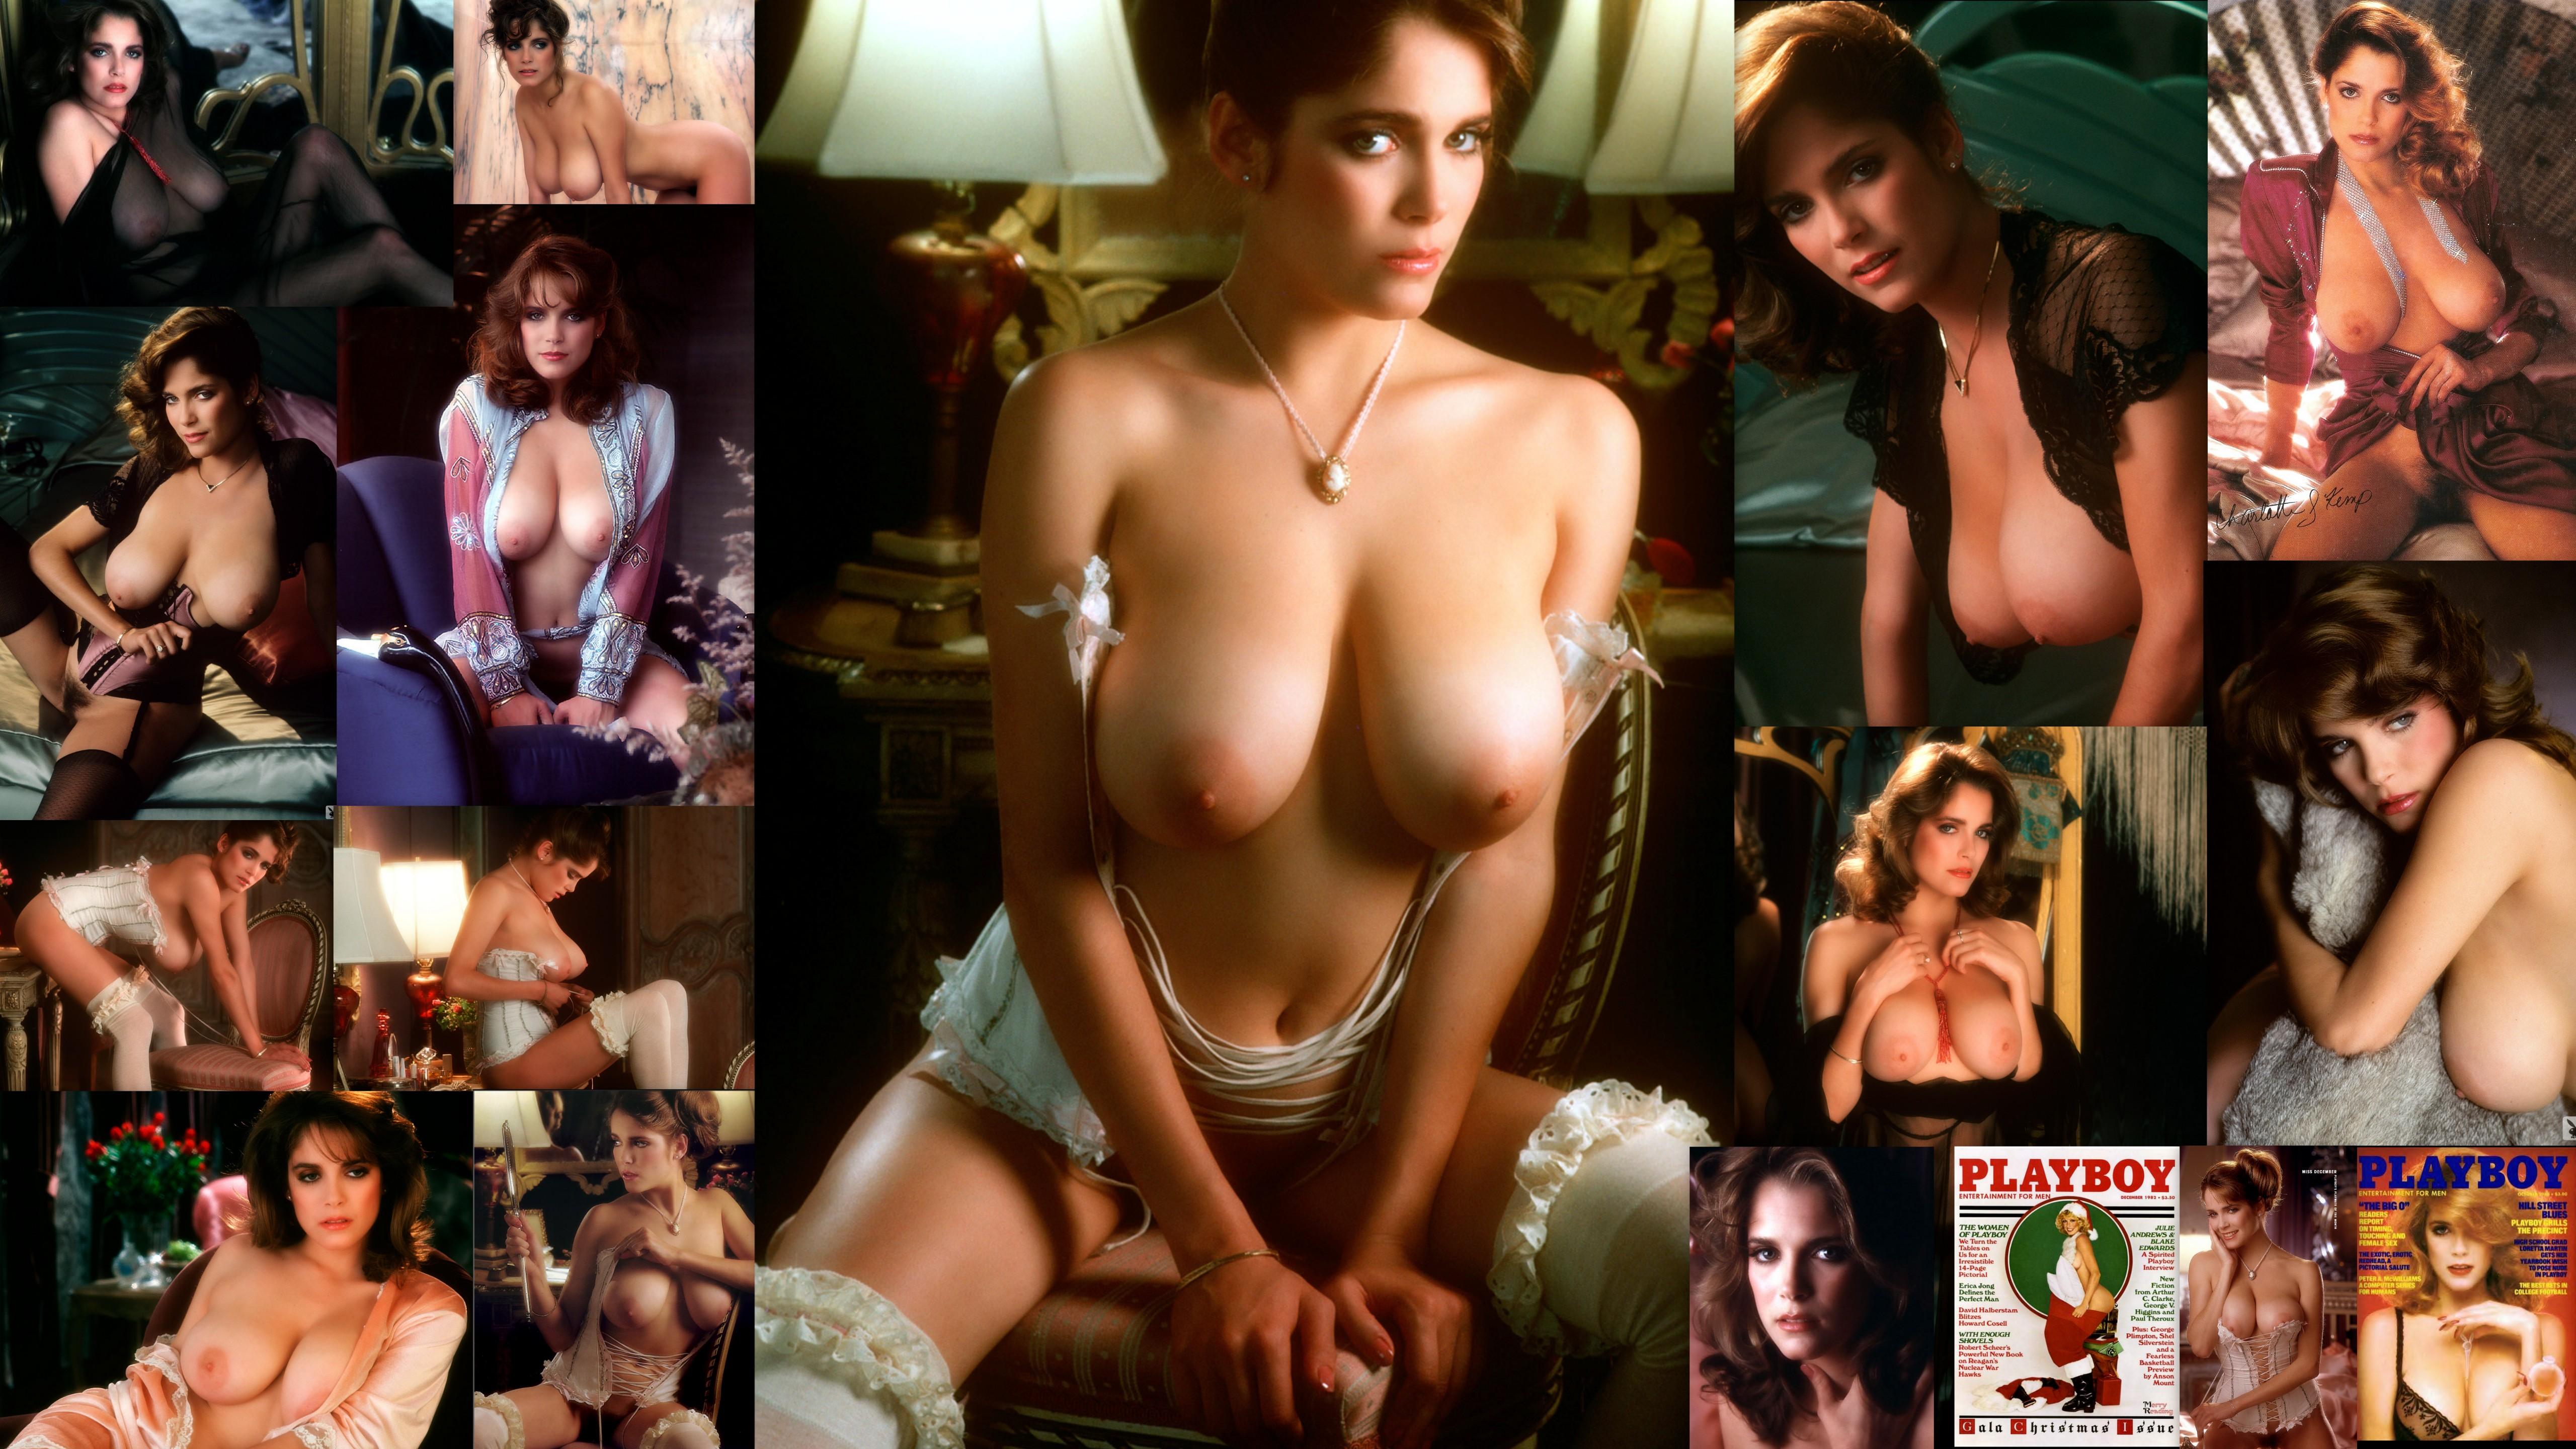 Playboy pics galleries